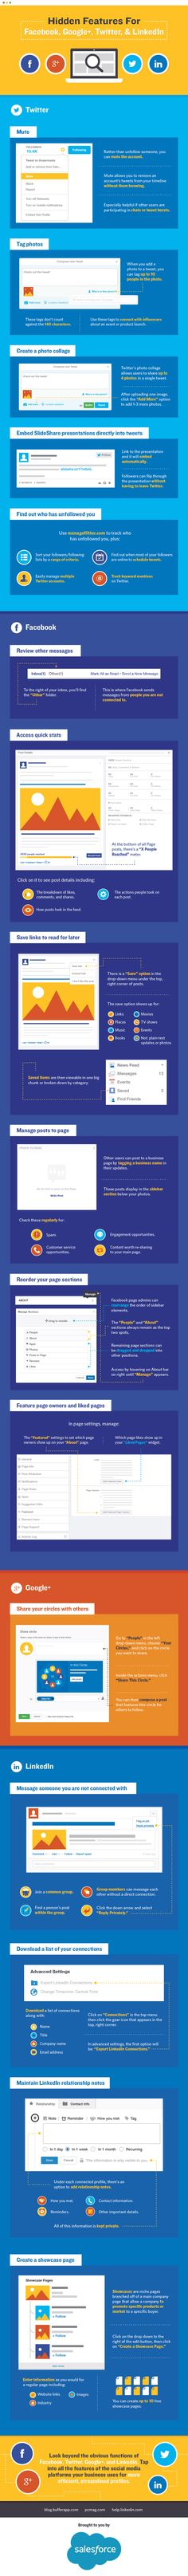 Hidden Social Media Features You Should Know